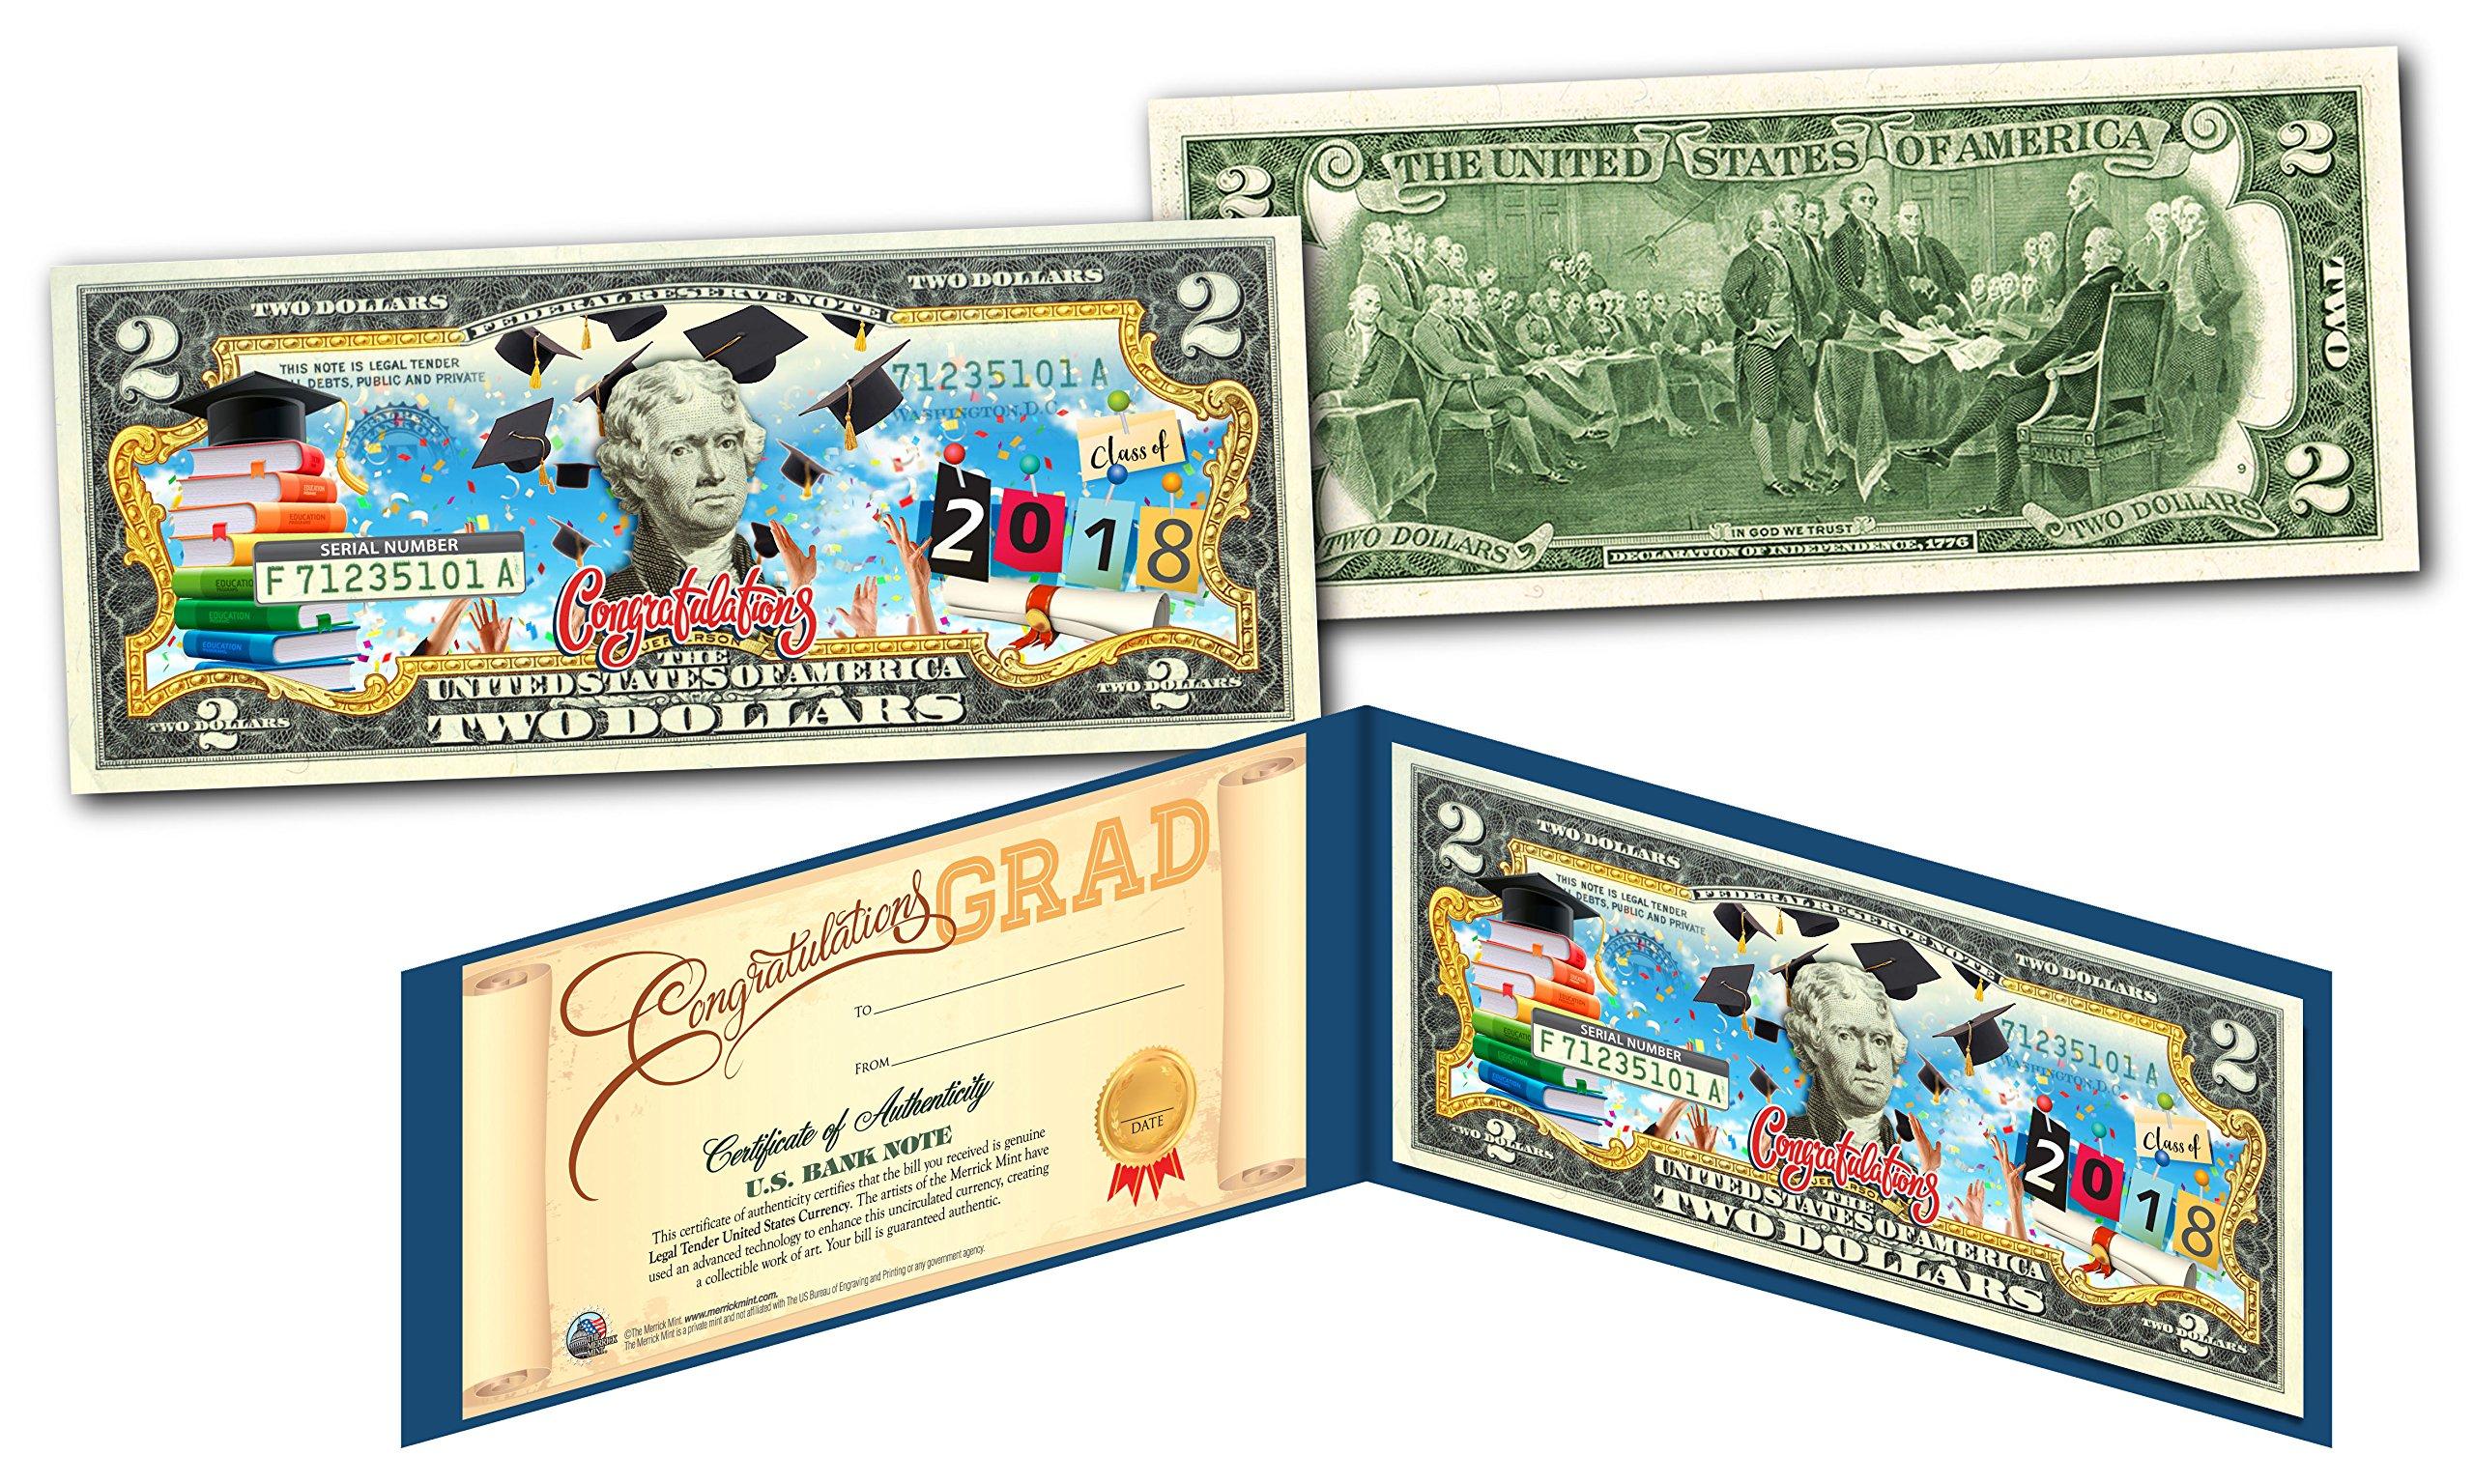 2018 HAPPY GRADUATION Genuine U.S. $2 Bill w/ Diploma Style Fill-In Certificate